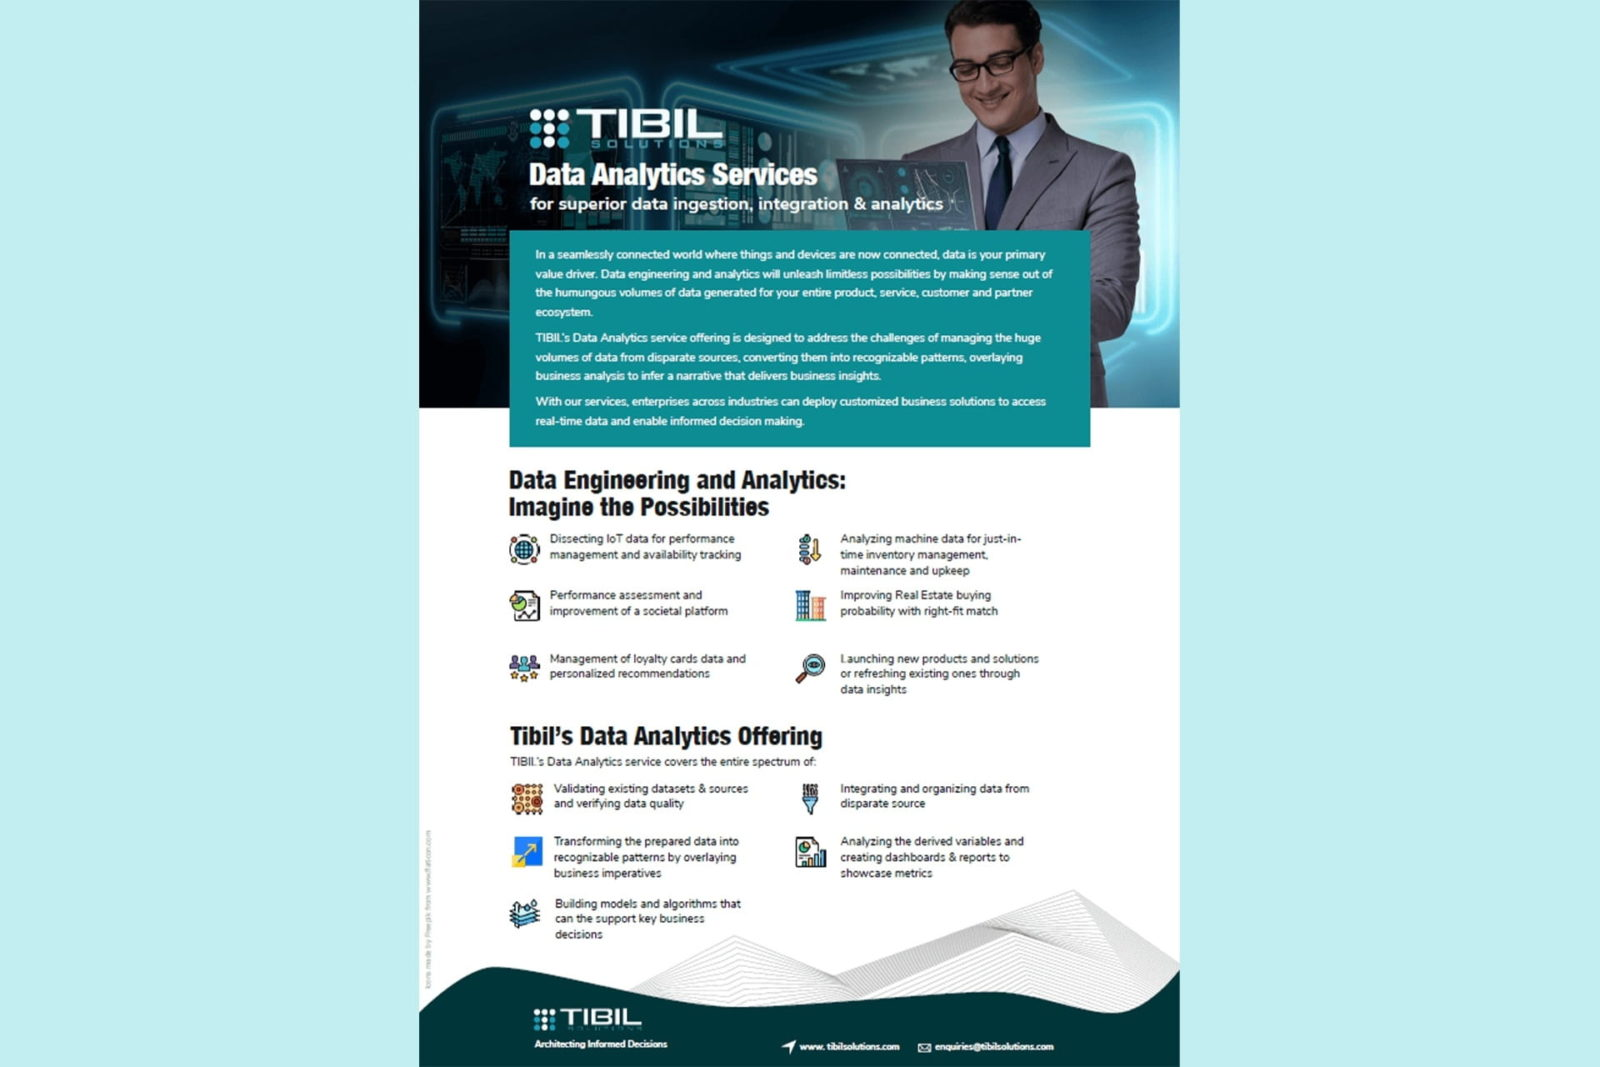 Tibil solutions